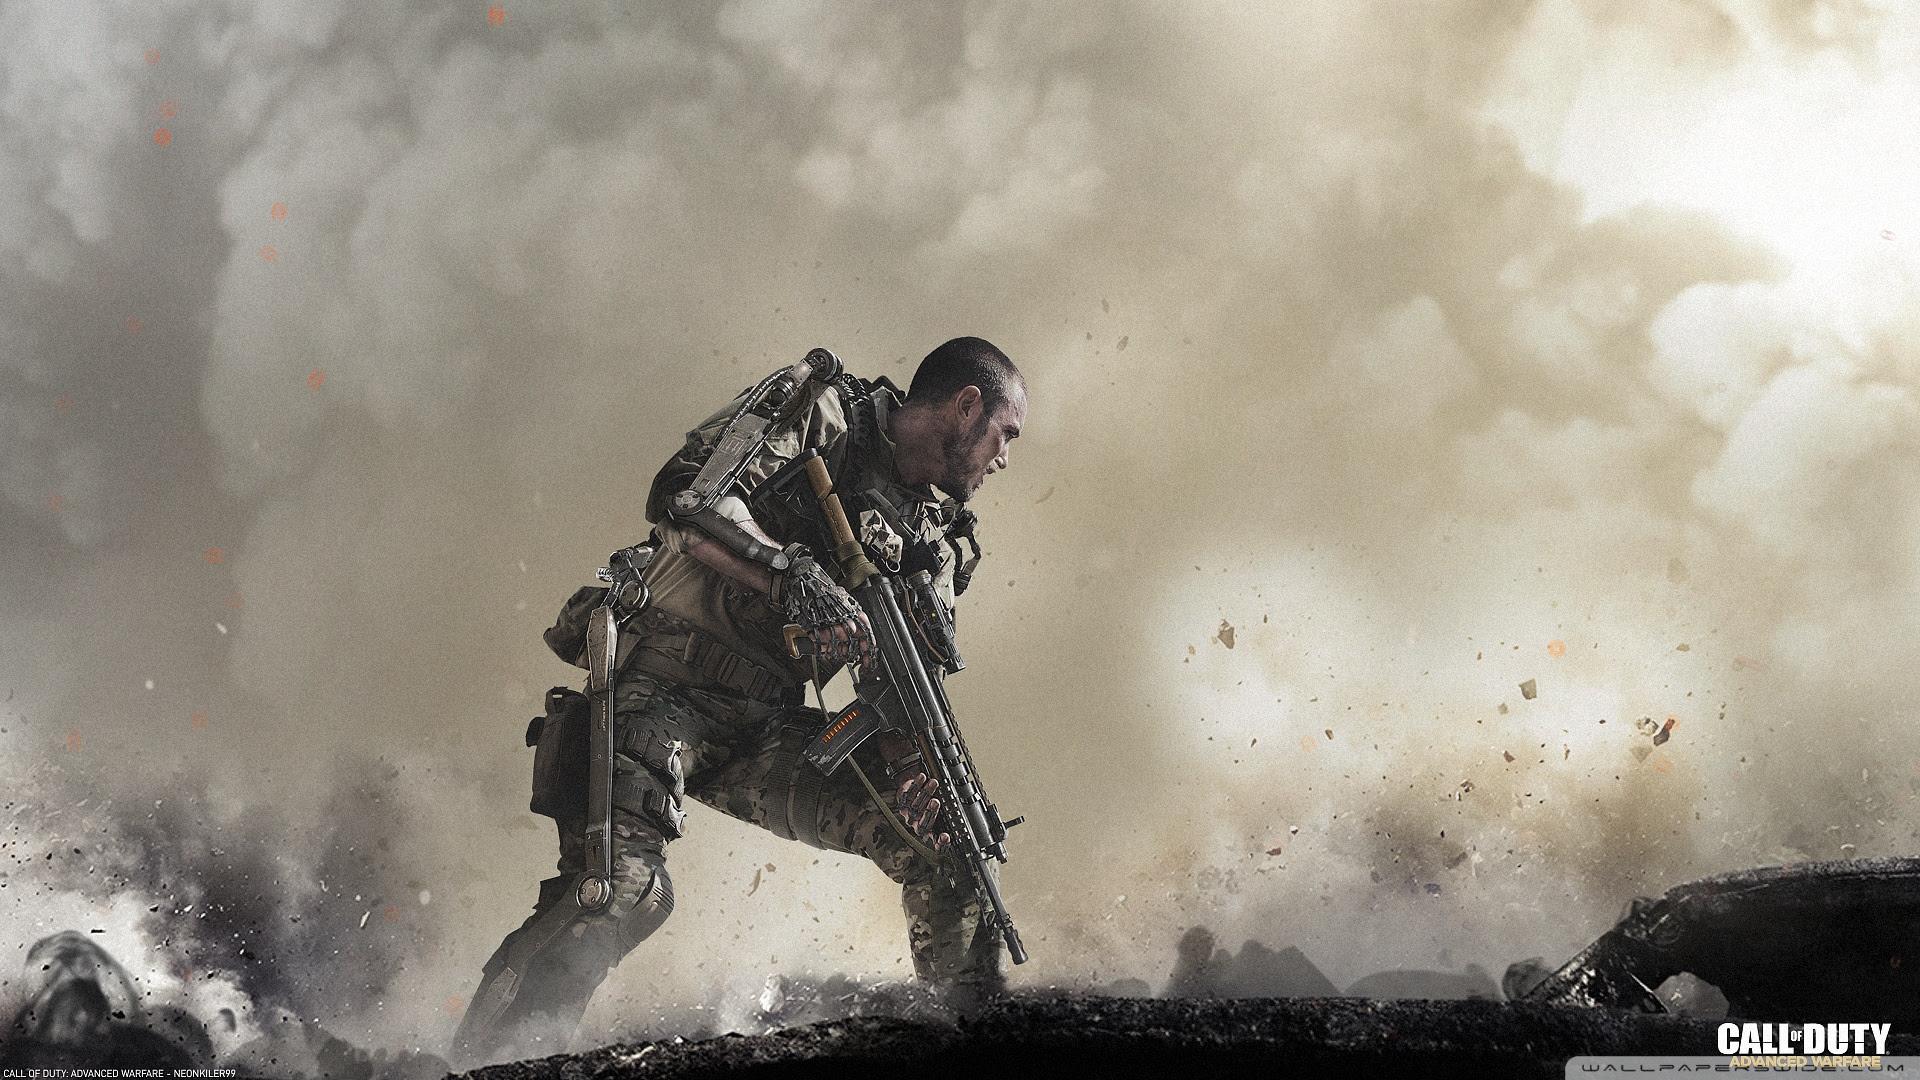 Call Of Duty Advanced Warfare Wallpaper 1920x1080 67336